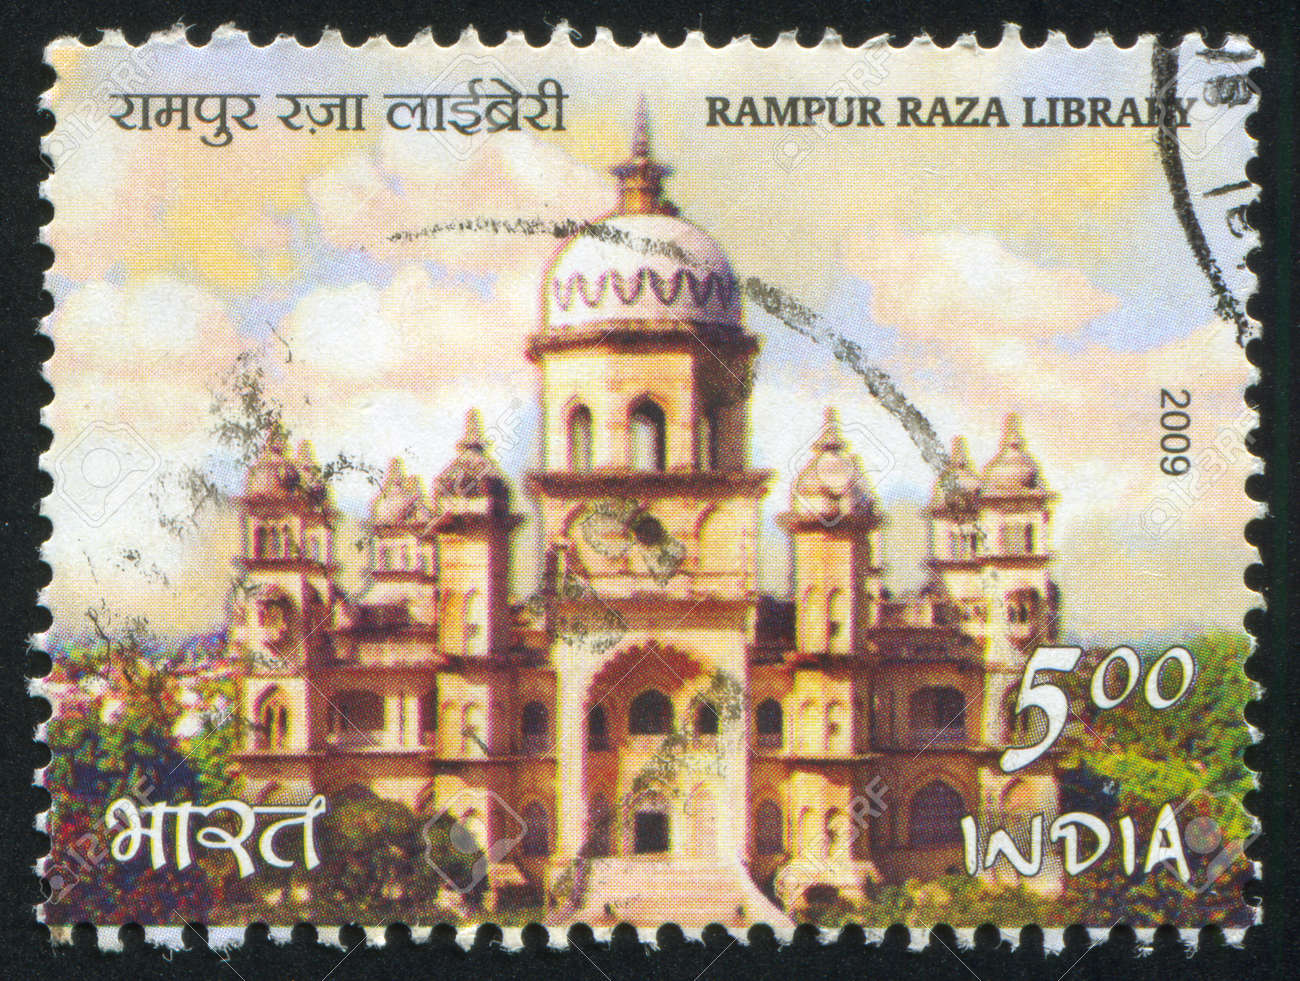 INDIA - CIRCA 2009: stamp printed by India, shows Rampur Raza Library, circa 2009 Stock Photo - 17145368